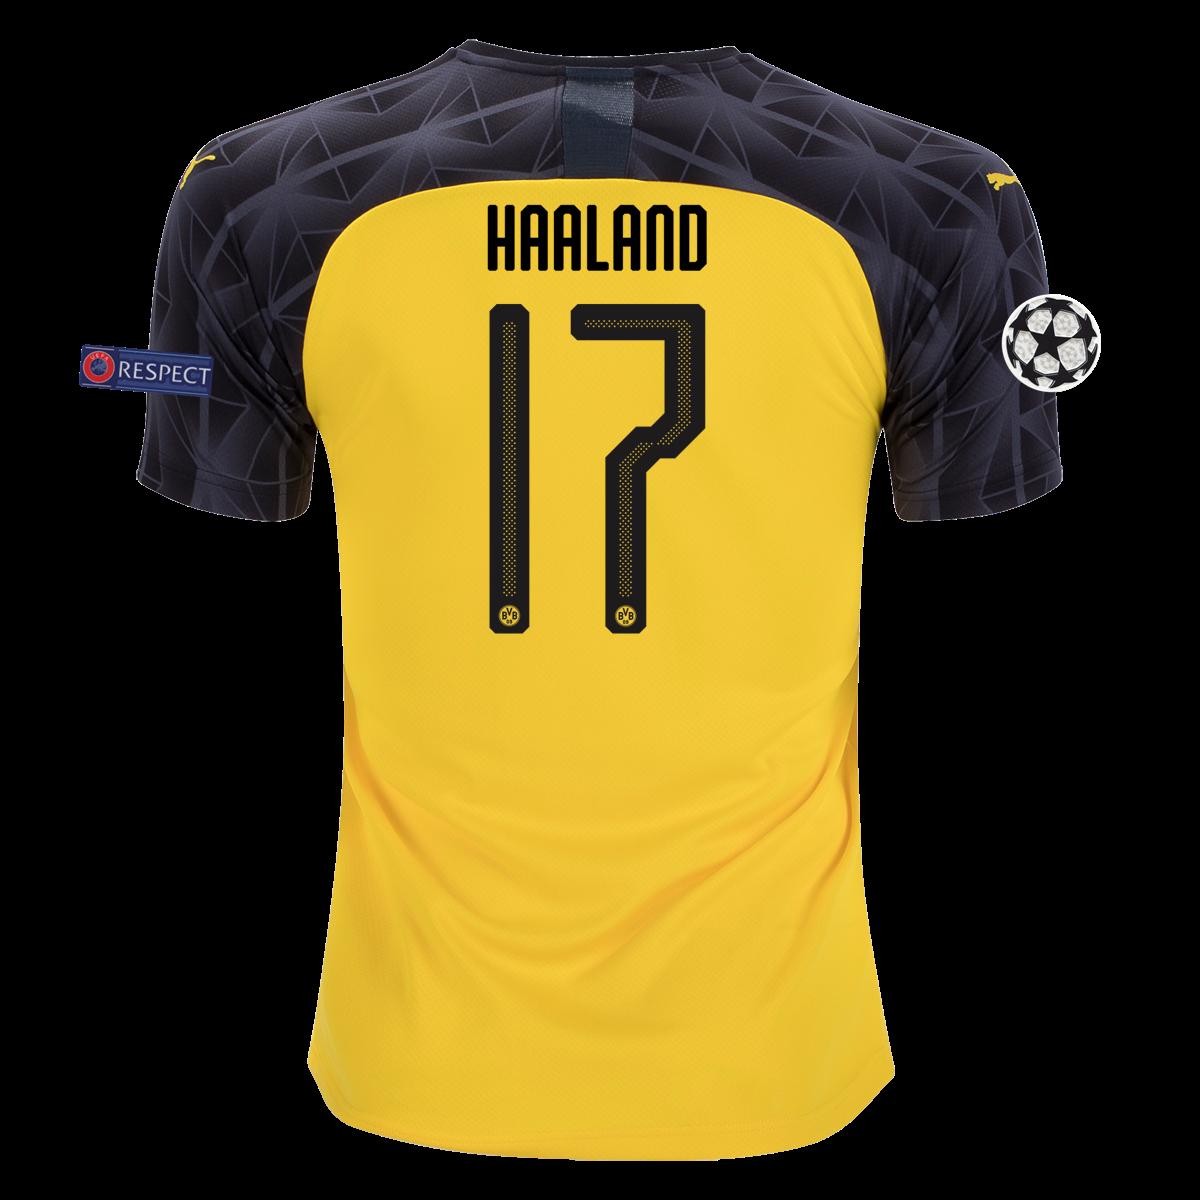 Puma Erling Haaland Borussia Dortmund Champions League Jersey 19 20 S In 2020 Dortmund Champions League Borussia Dortmund